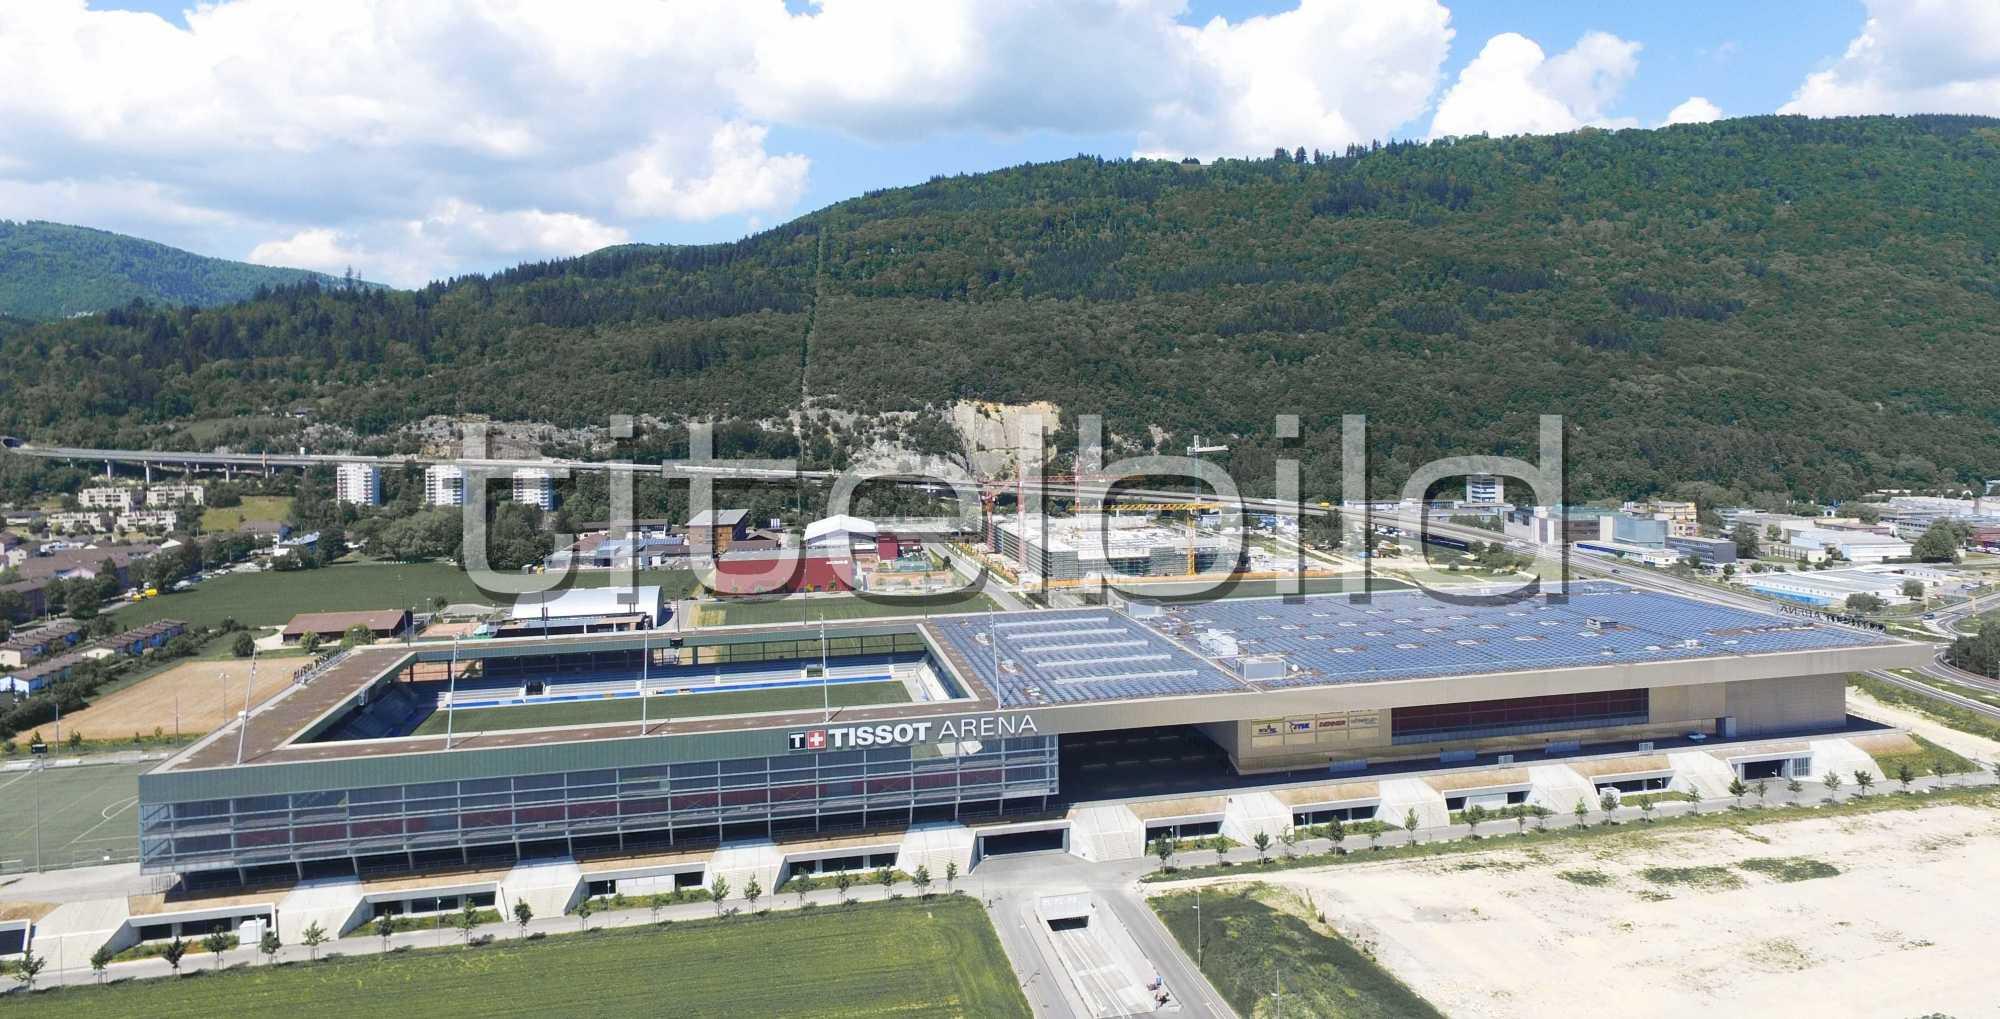 Projektbild-Nr. 1: Tissot Arena